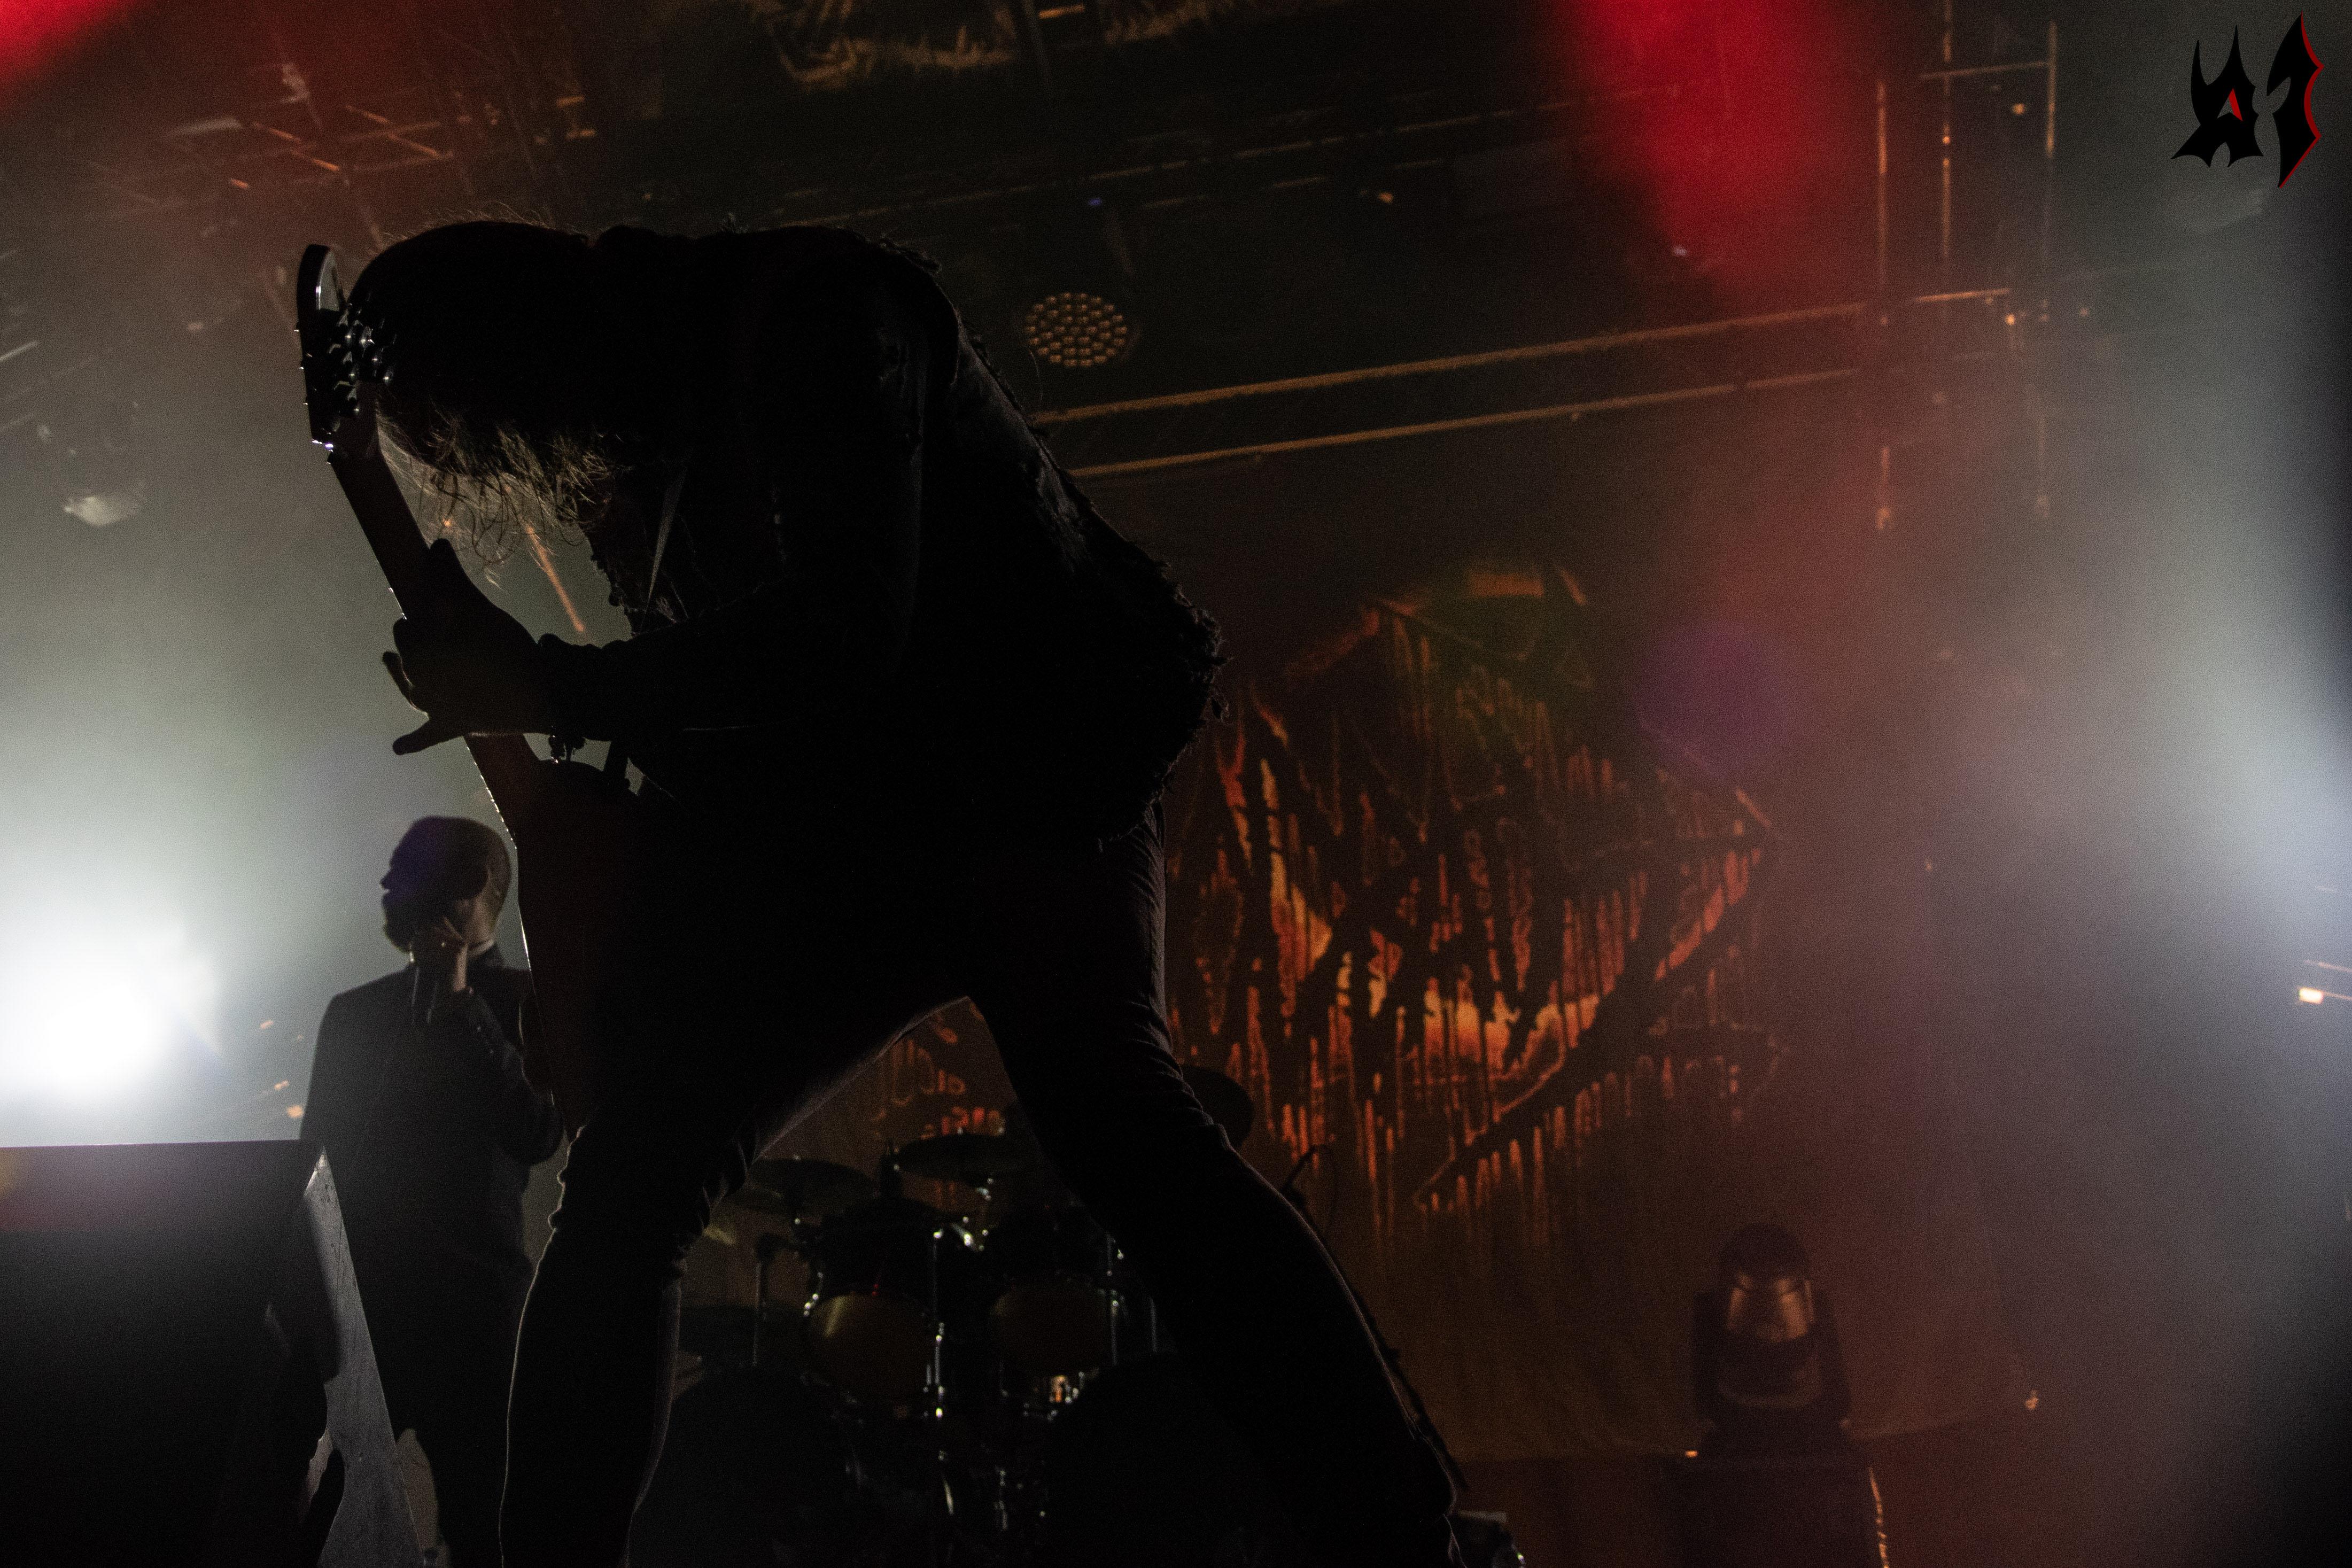 Hellfest - Bloodbath - 24